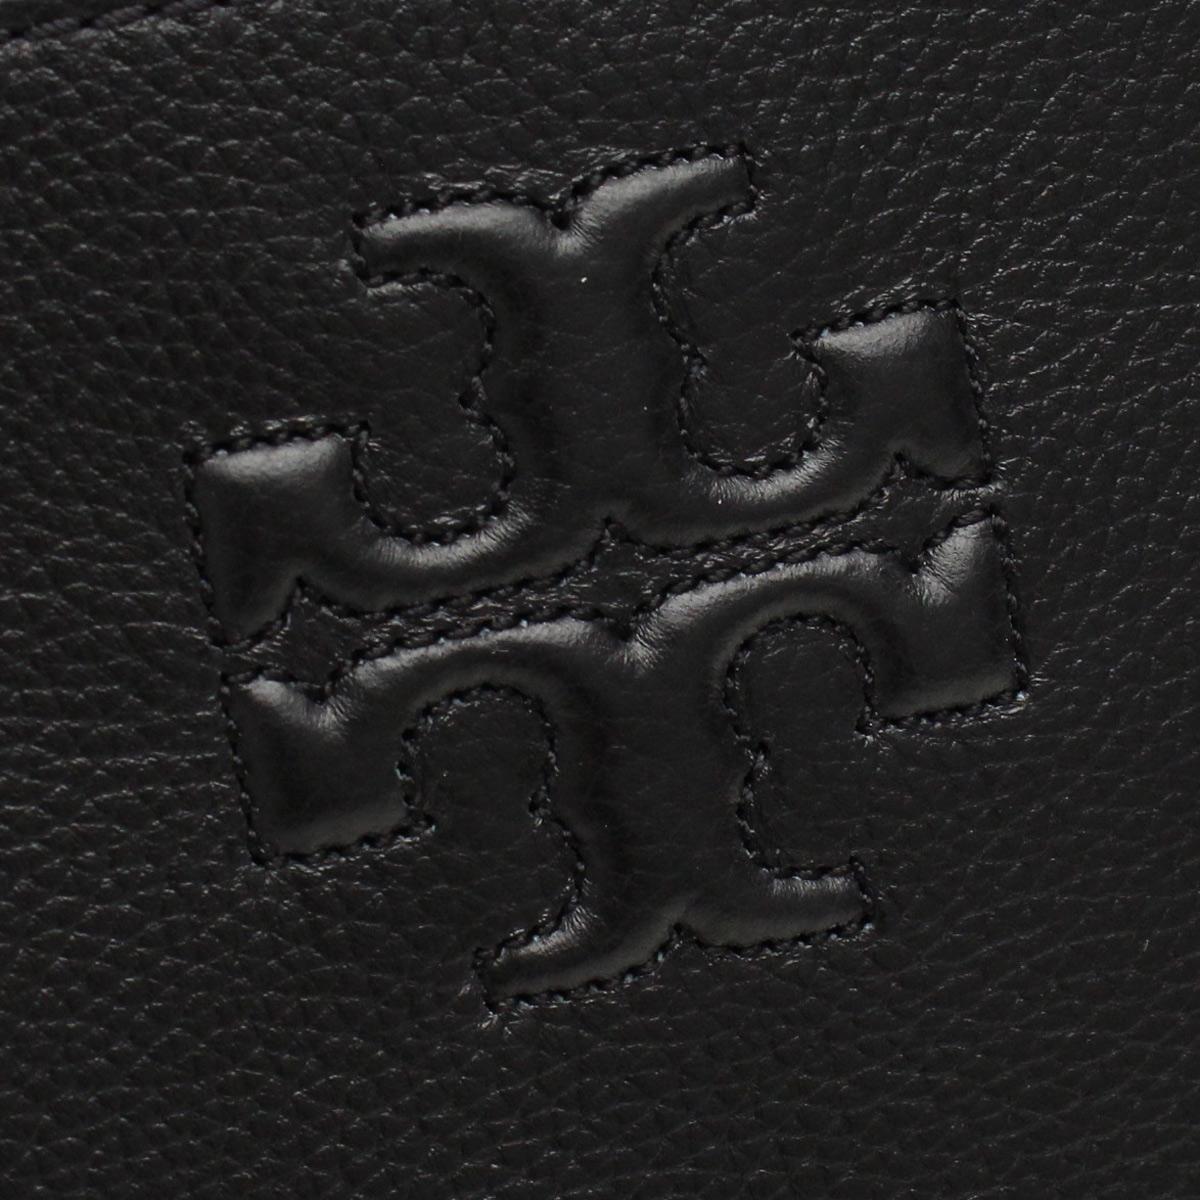 (TORY BURCH) Tory Burch ELLA tote bag 41159501-009 BLACK/BLACK black( taxfree/send by EMS/authentic/A brand new item )